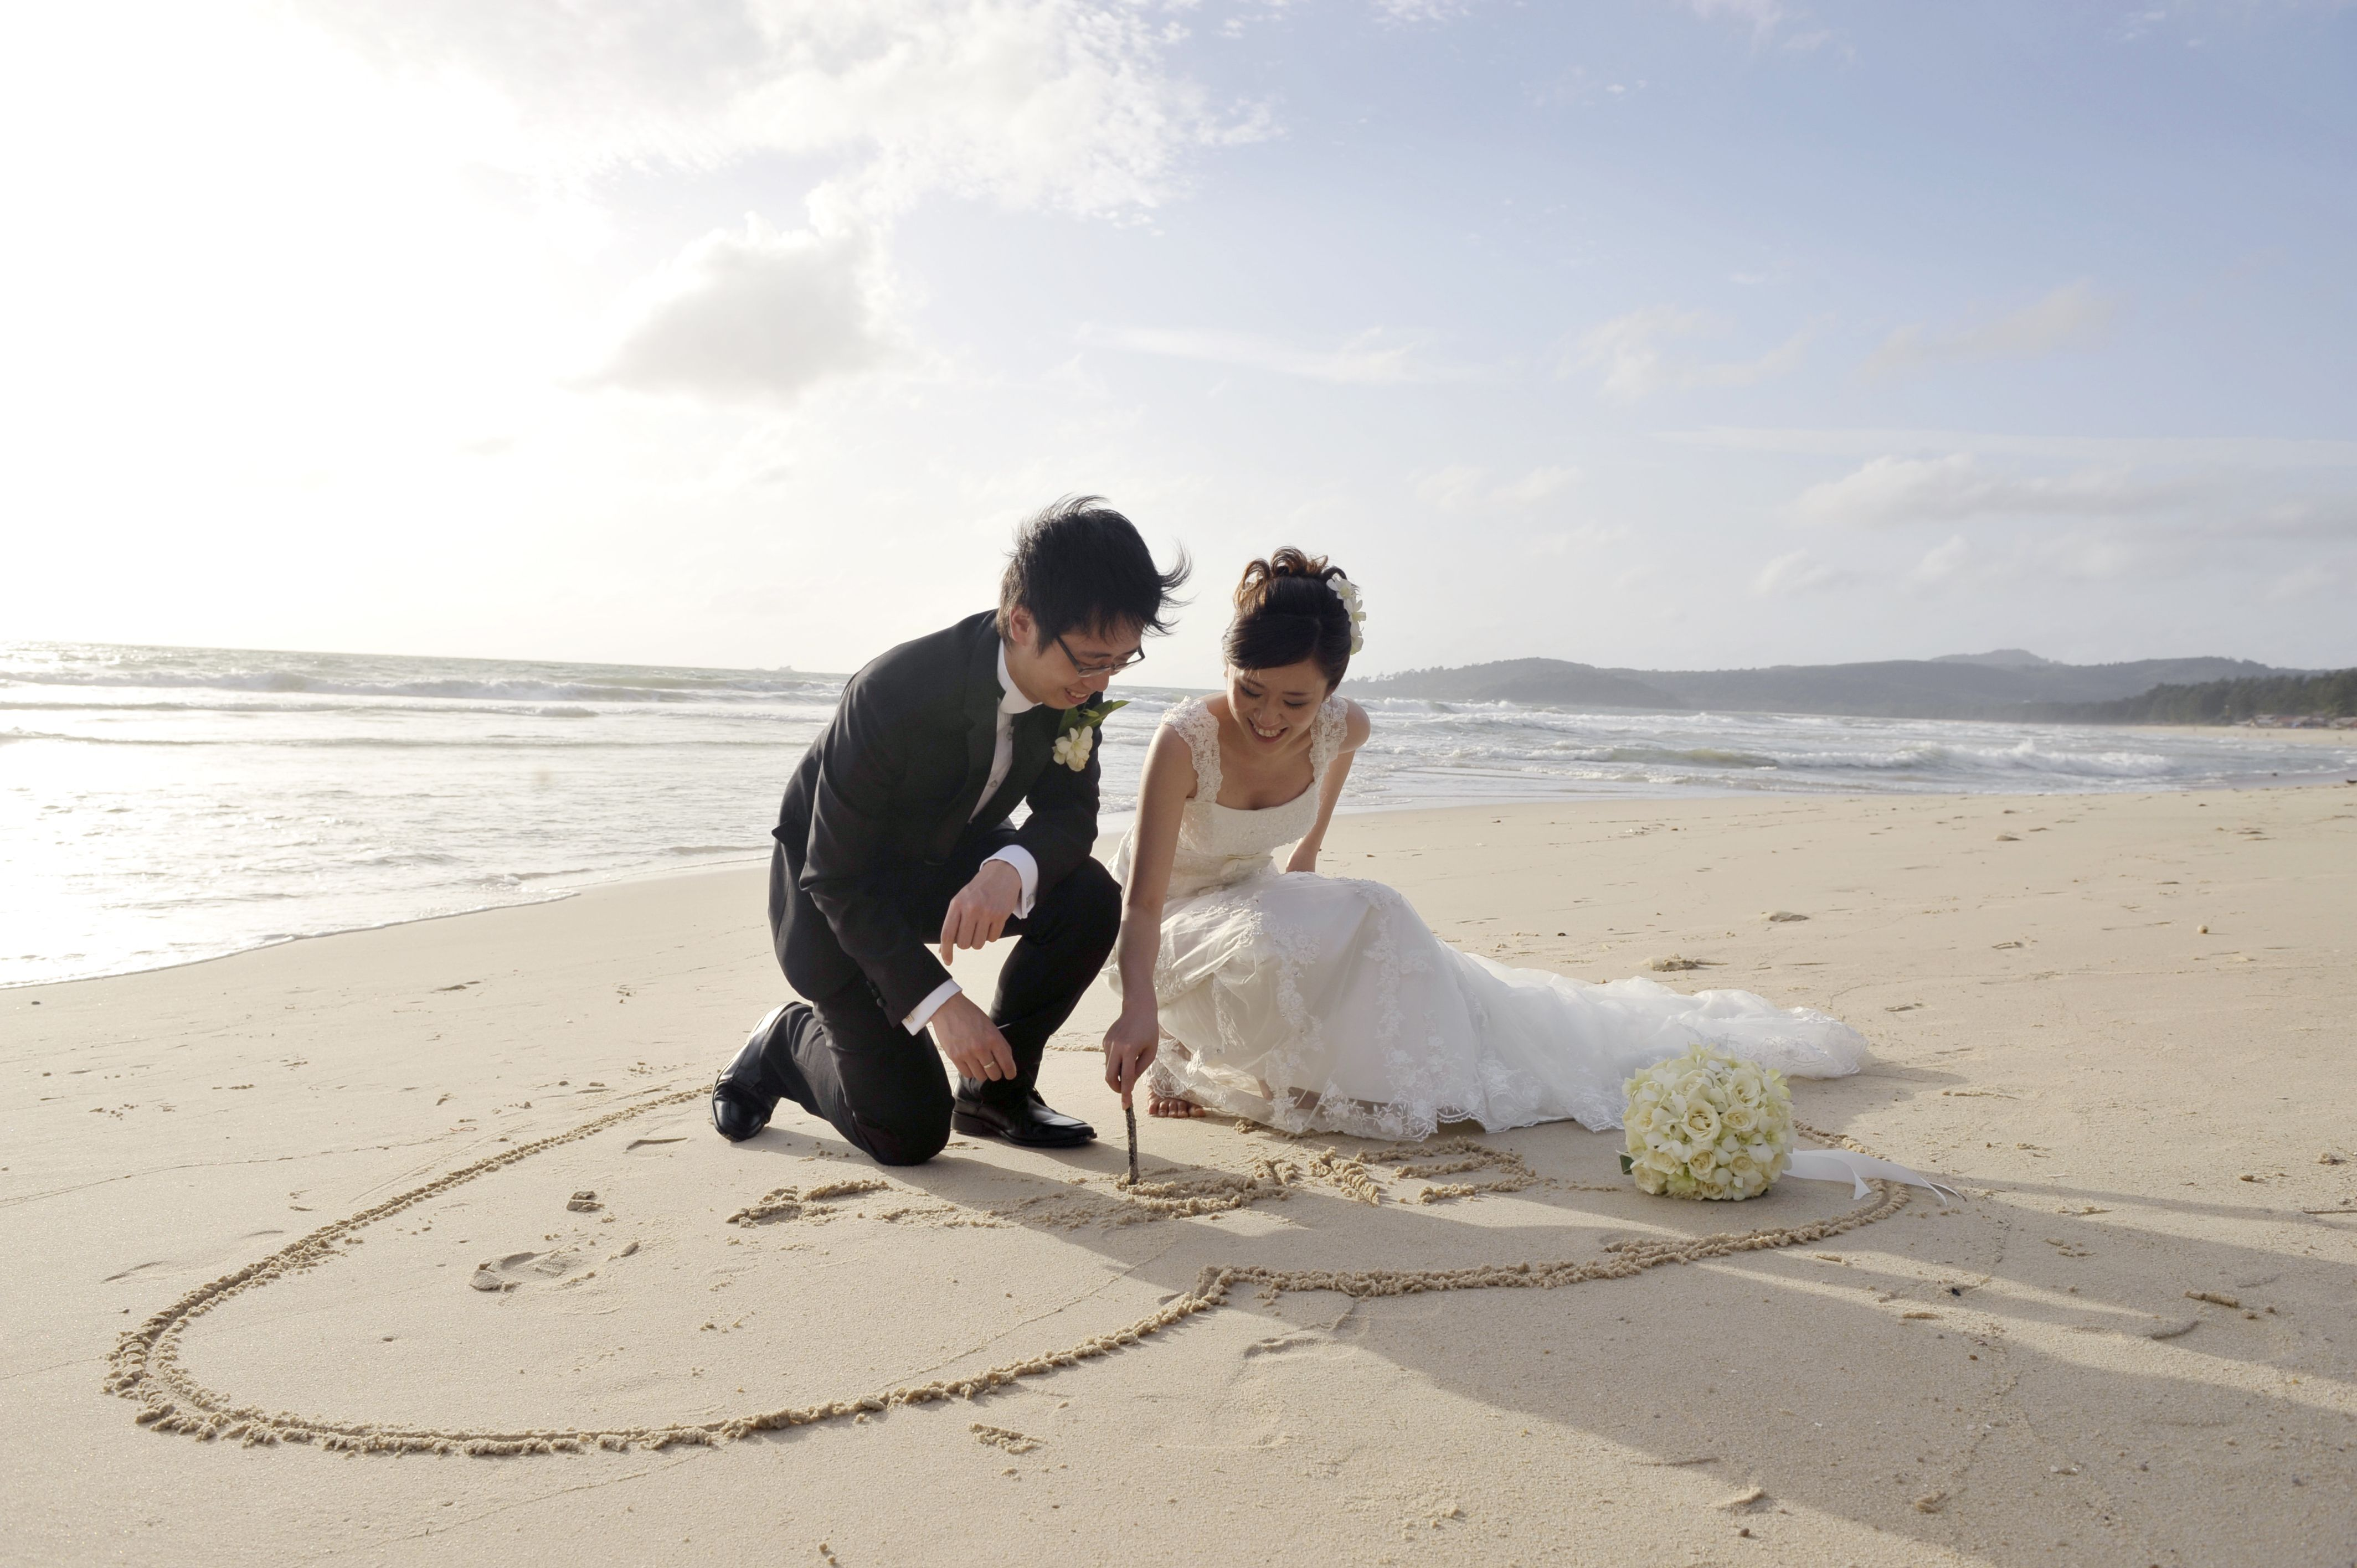 editing-beach-photos-in-photoshop-photo-editing-example